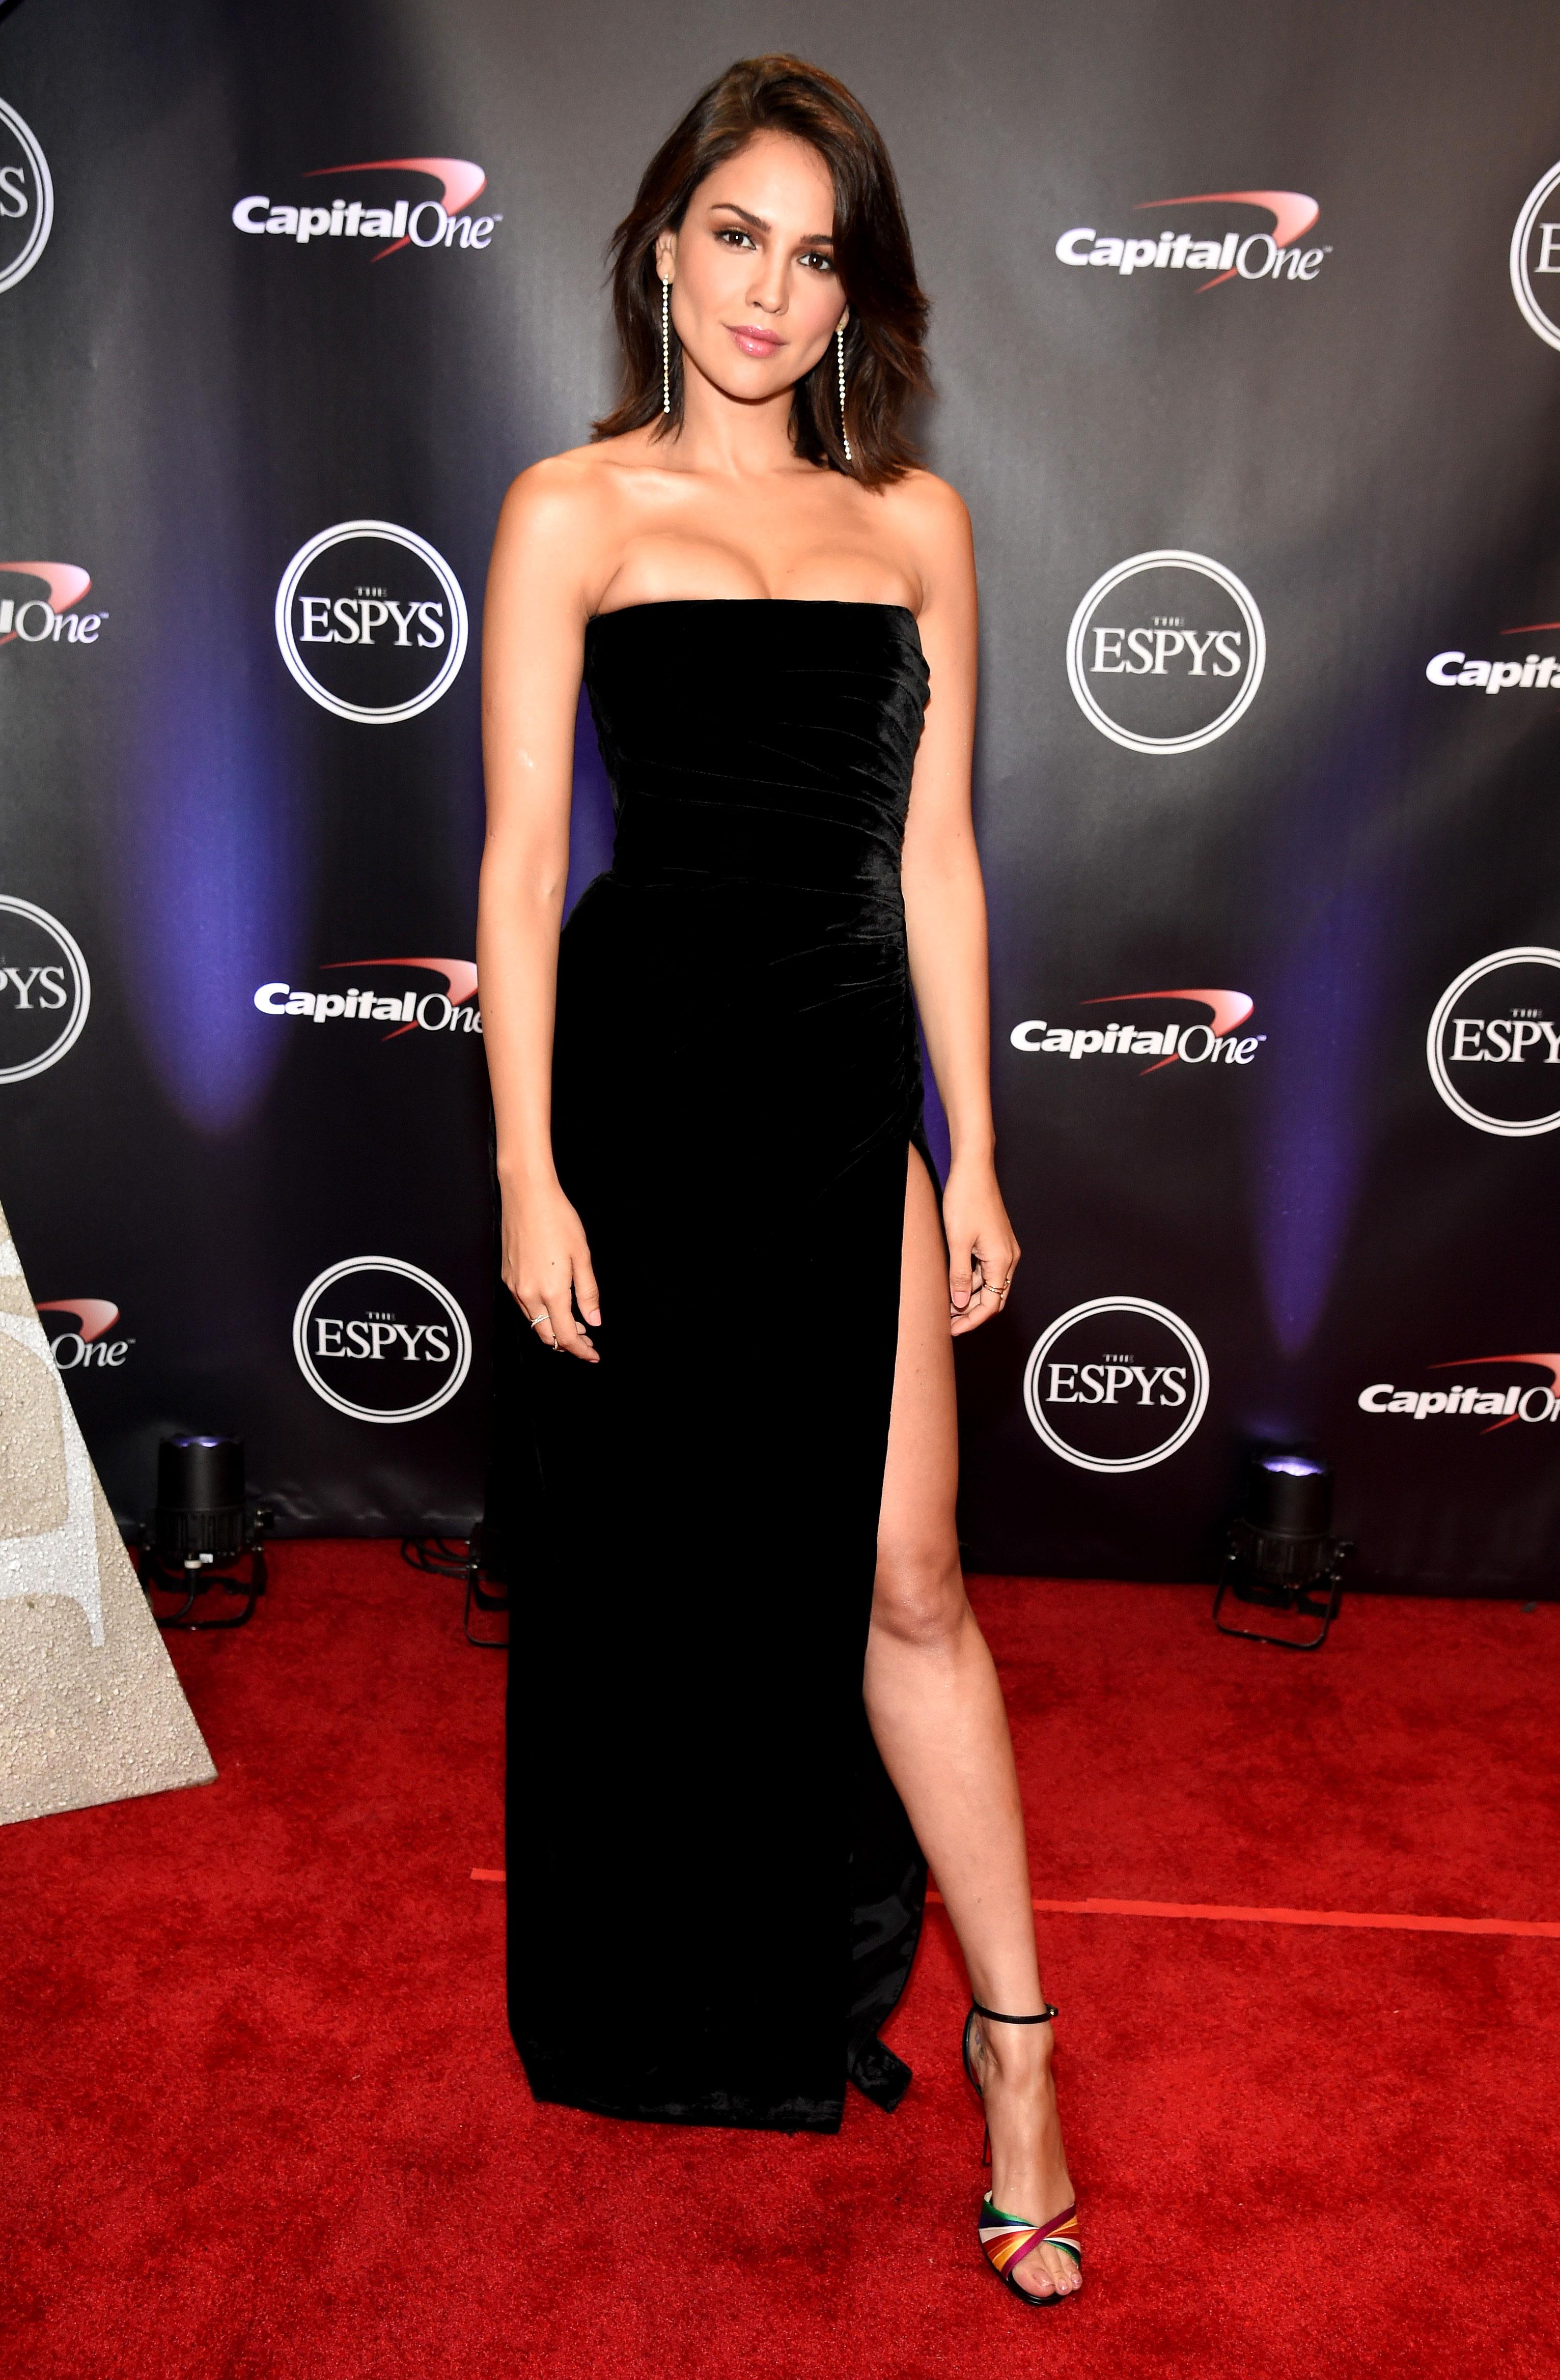 Eiza-Gonzalez-espys - Wearing a black velvet strapless Rasario gown, colorful sandals and Jennifer Meyer jewels.